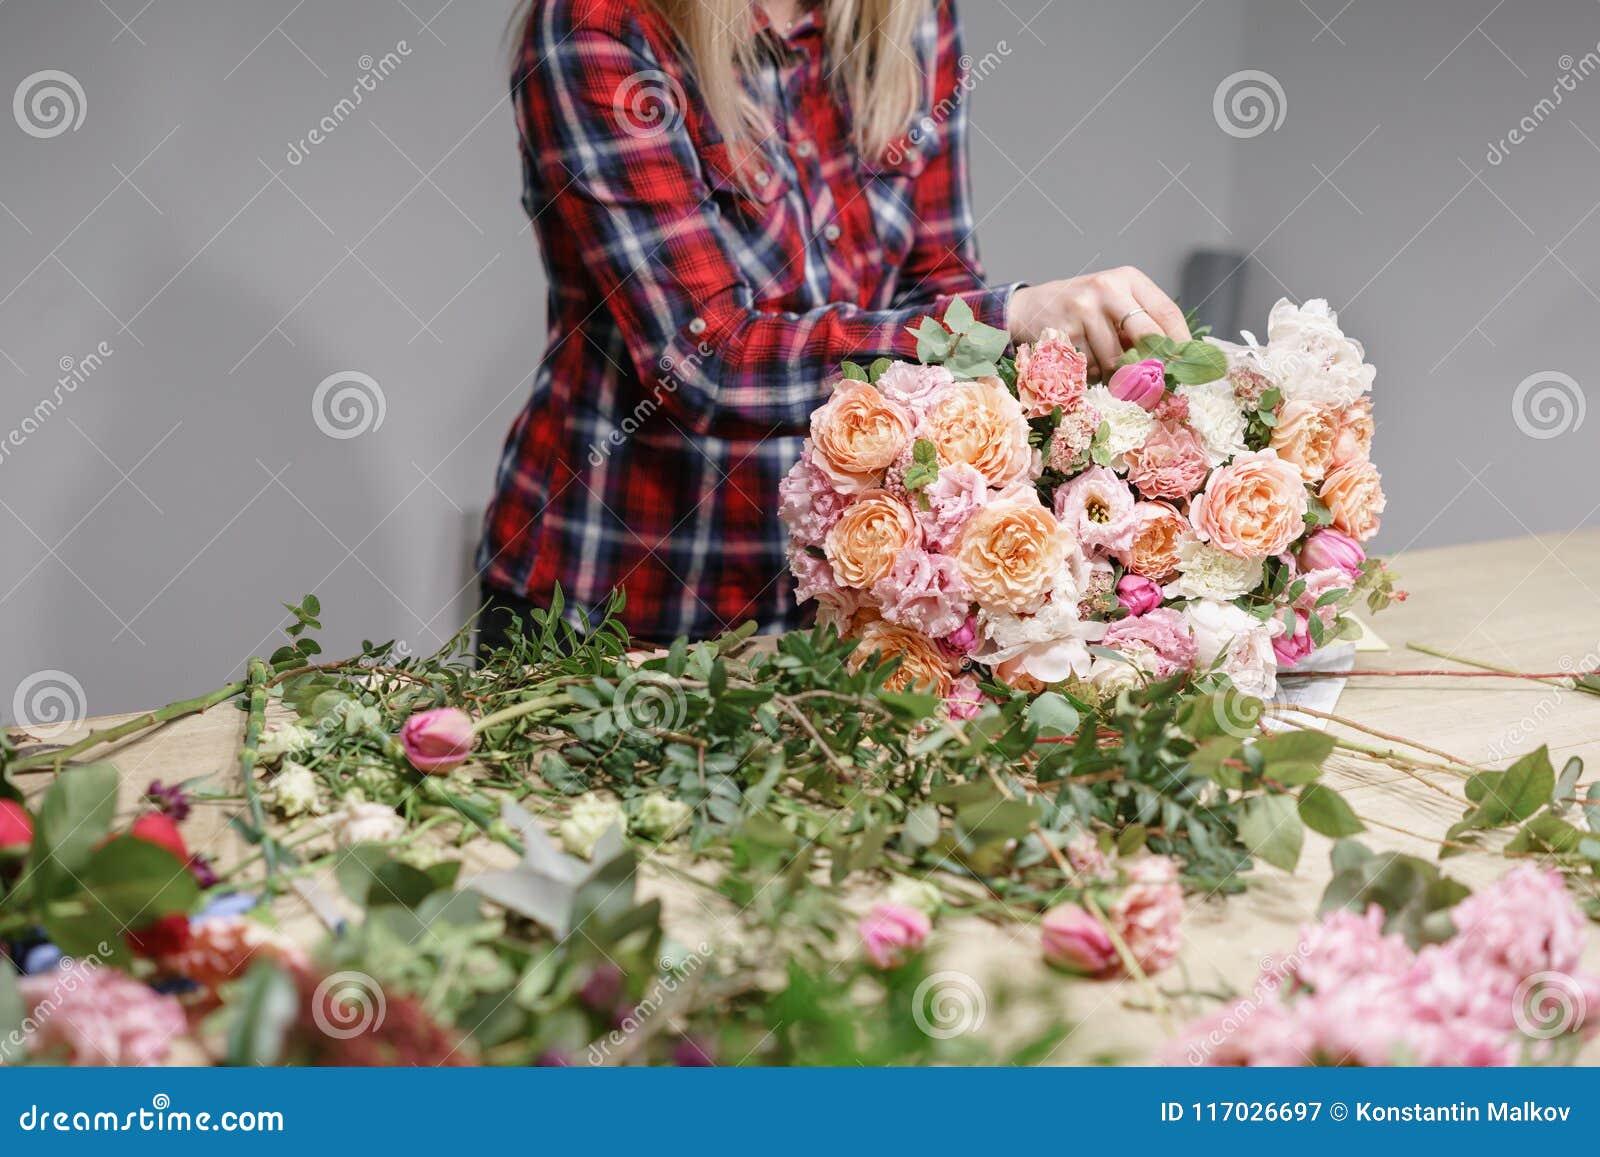 Female Florist Floral Workshop Woman Making A Beautiful Flower